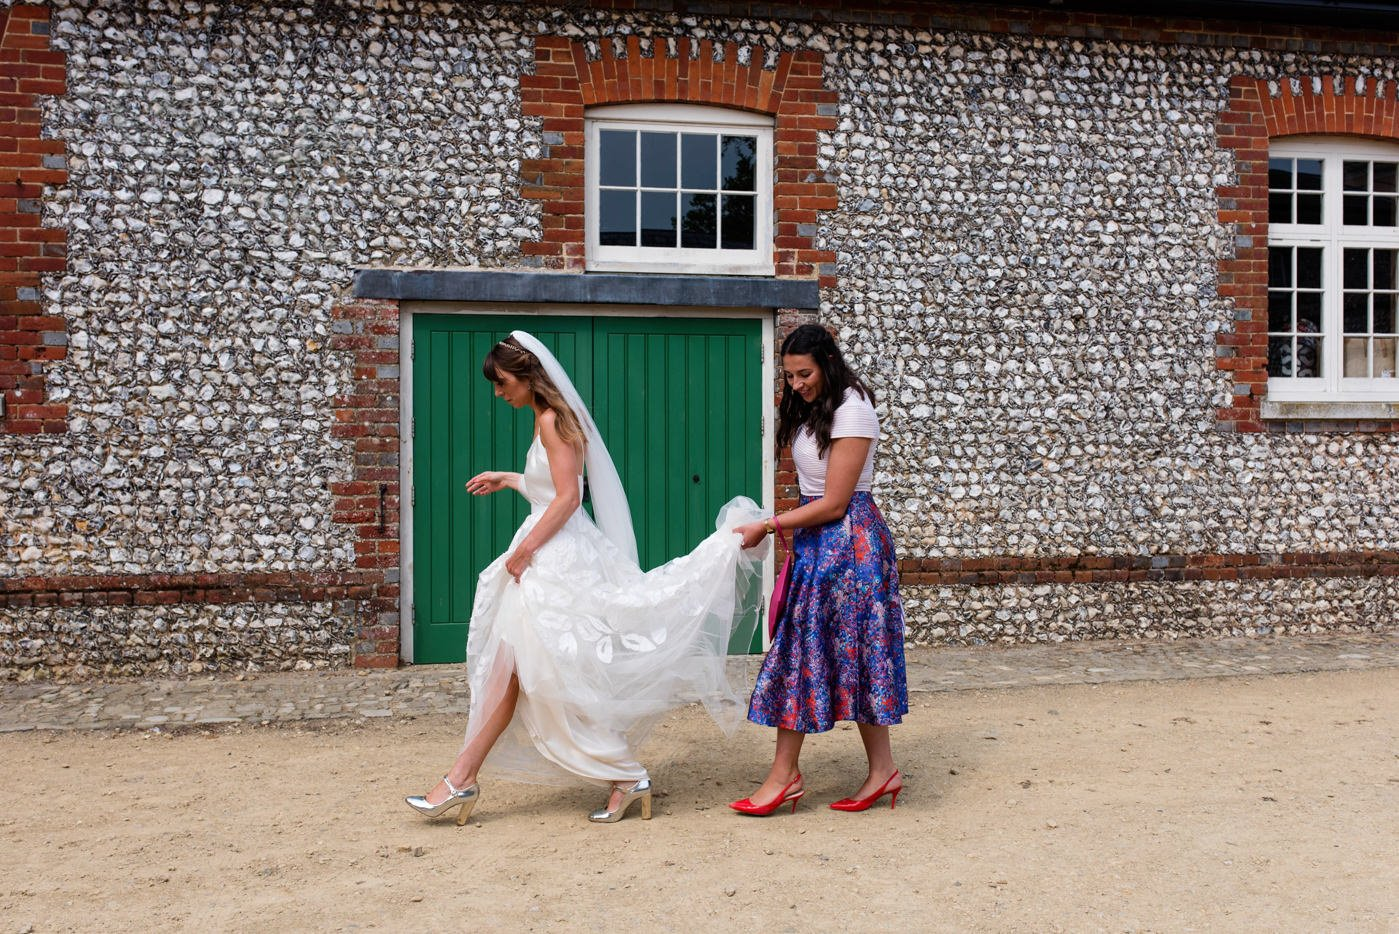 bignor-park-wedding-photography-robyn-and-tom-43